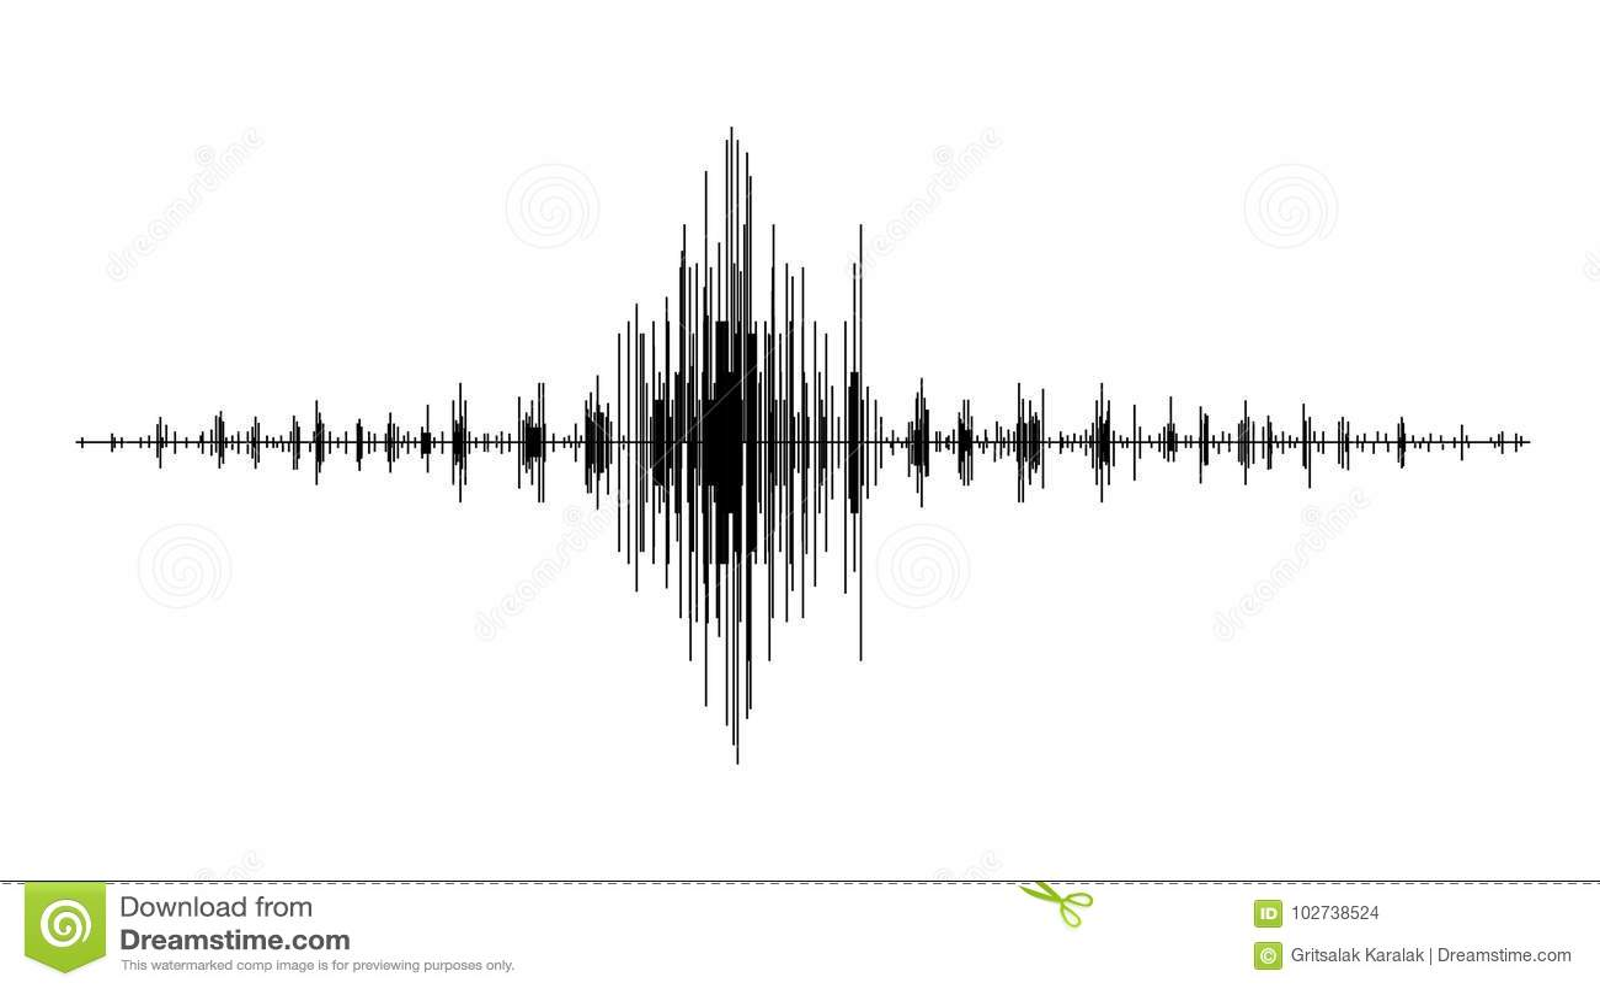 earthquake wave diagram   seismogram of different seismic